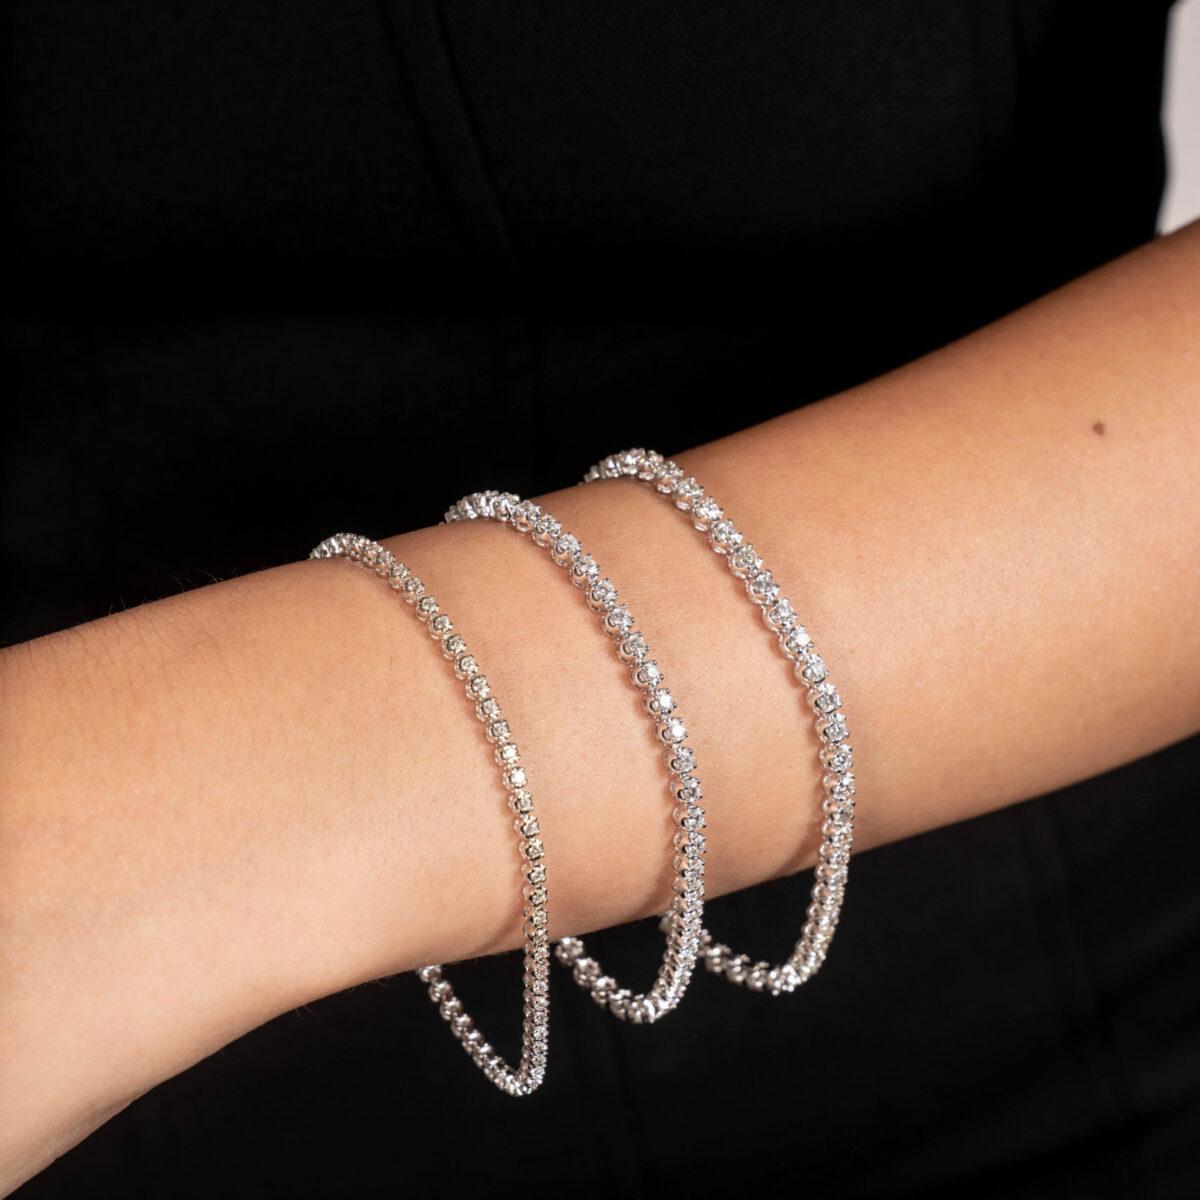 Dimond Tennis Bracelet in Sydney